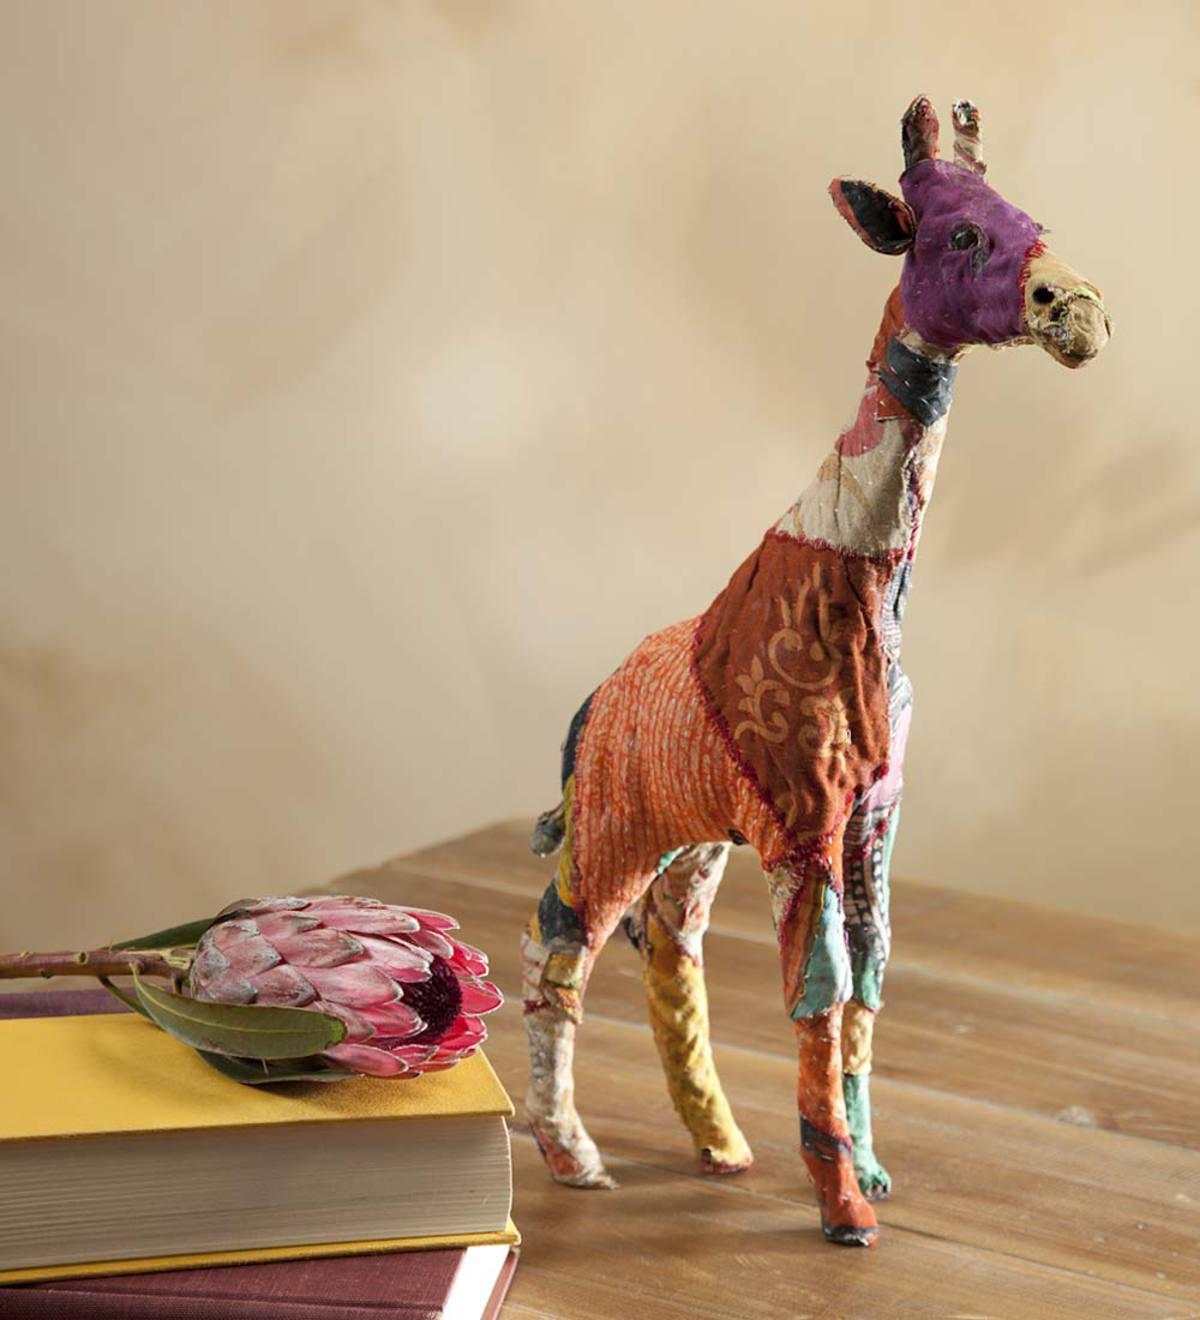 Vintage Sari Giraffe Sculpture Vintage Retro Gifts Hidden And